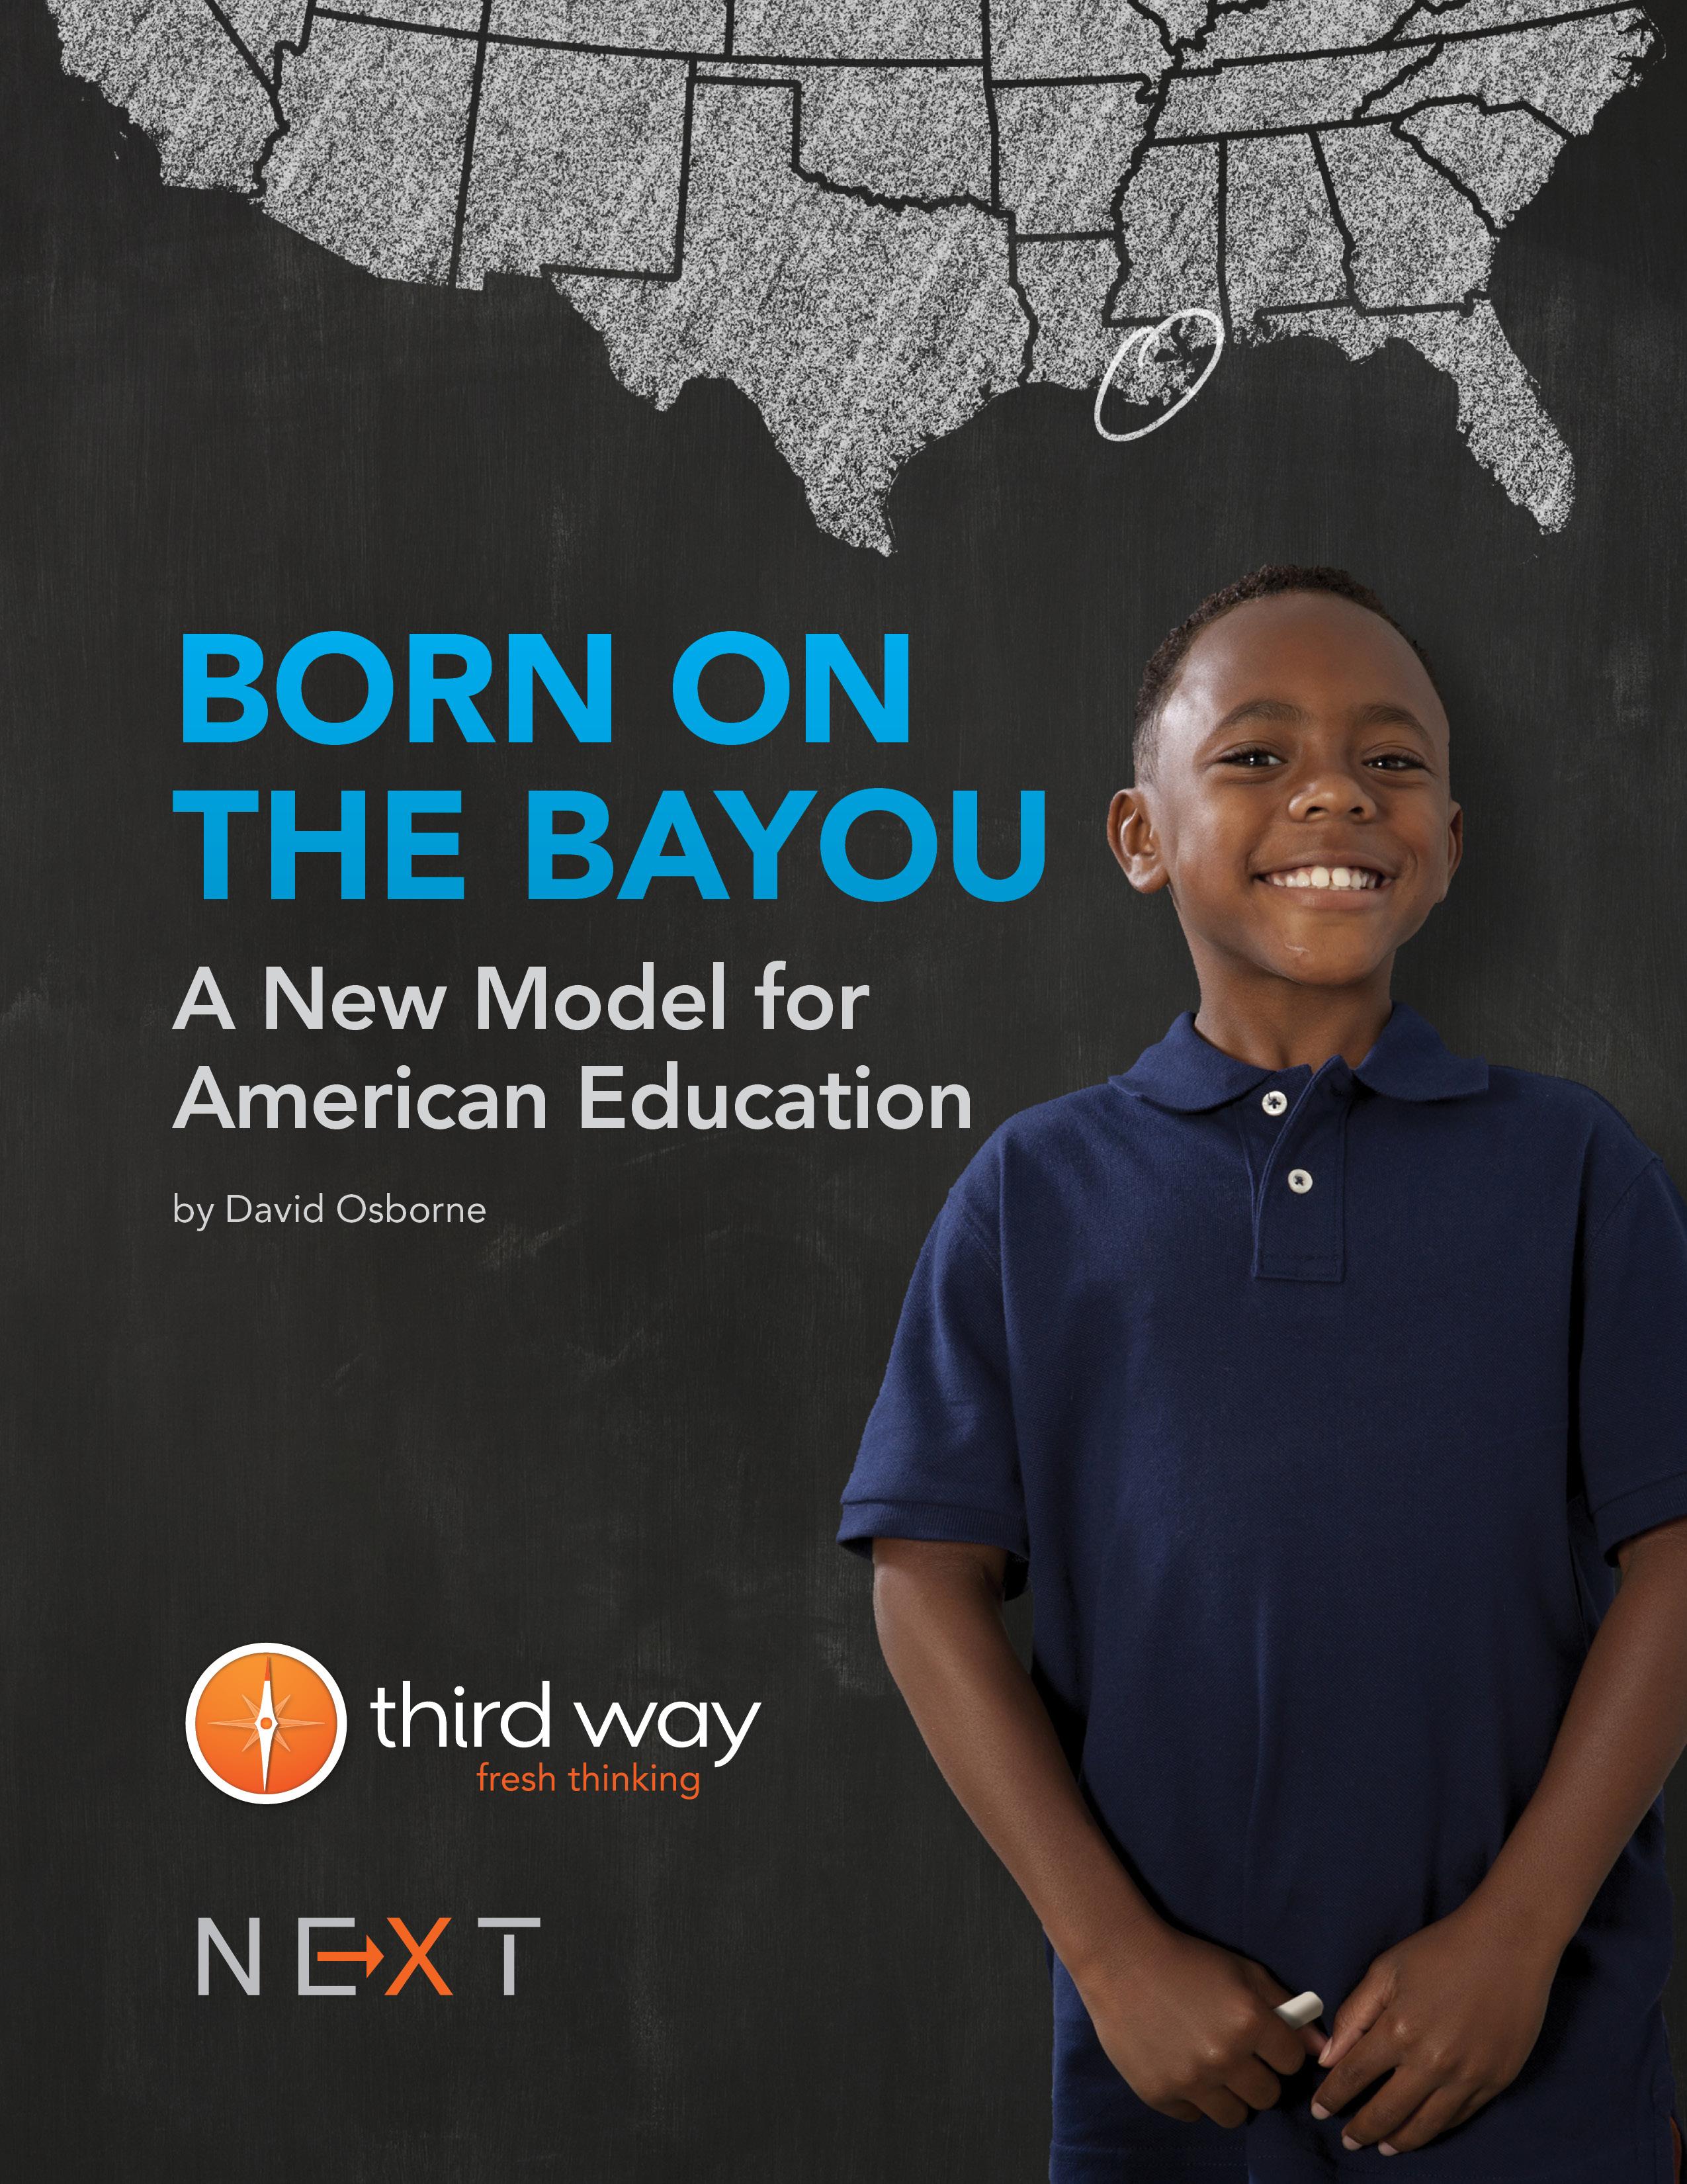 Born on the Bayou Cover